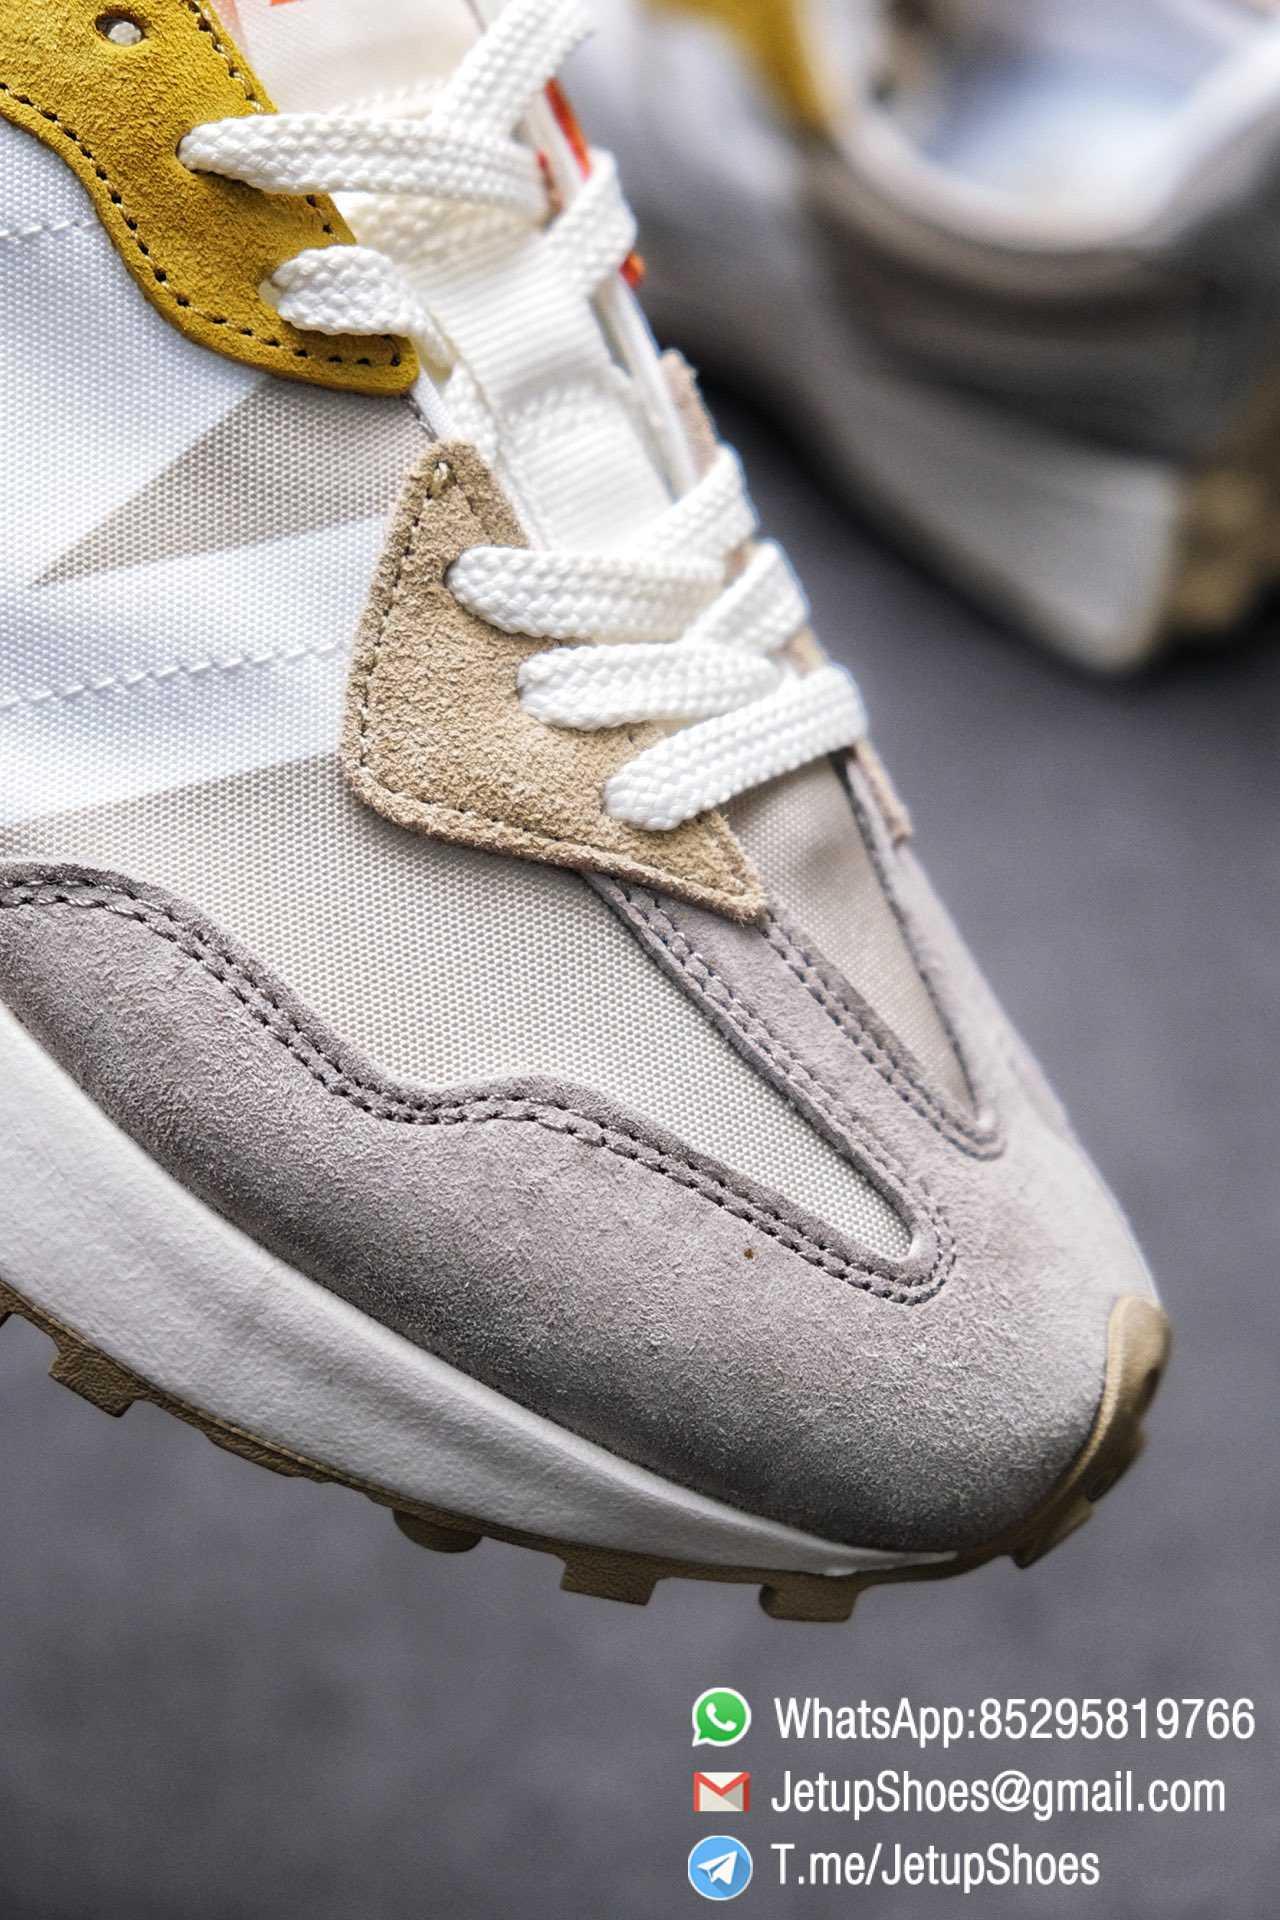 Best Replica New Balance Wmns 327 Light Grey Grey Khaki Upper SKU WS327MS RepSneakers Top Snkrs 05